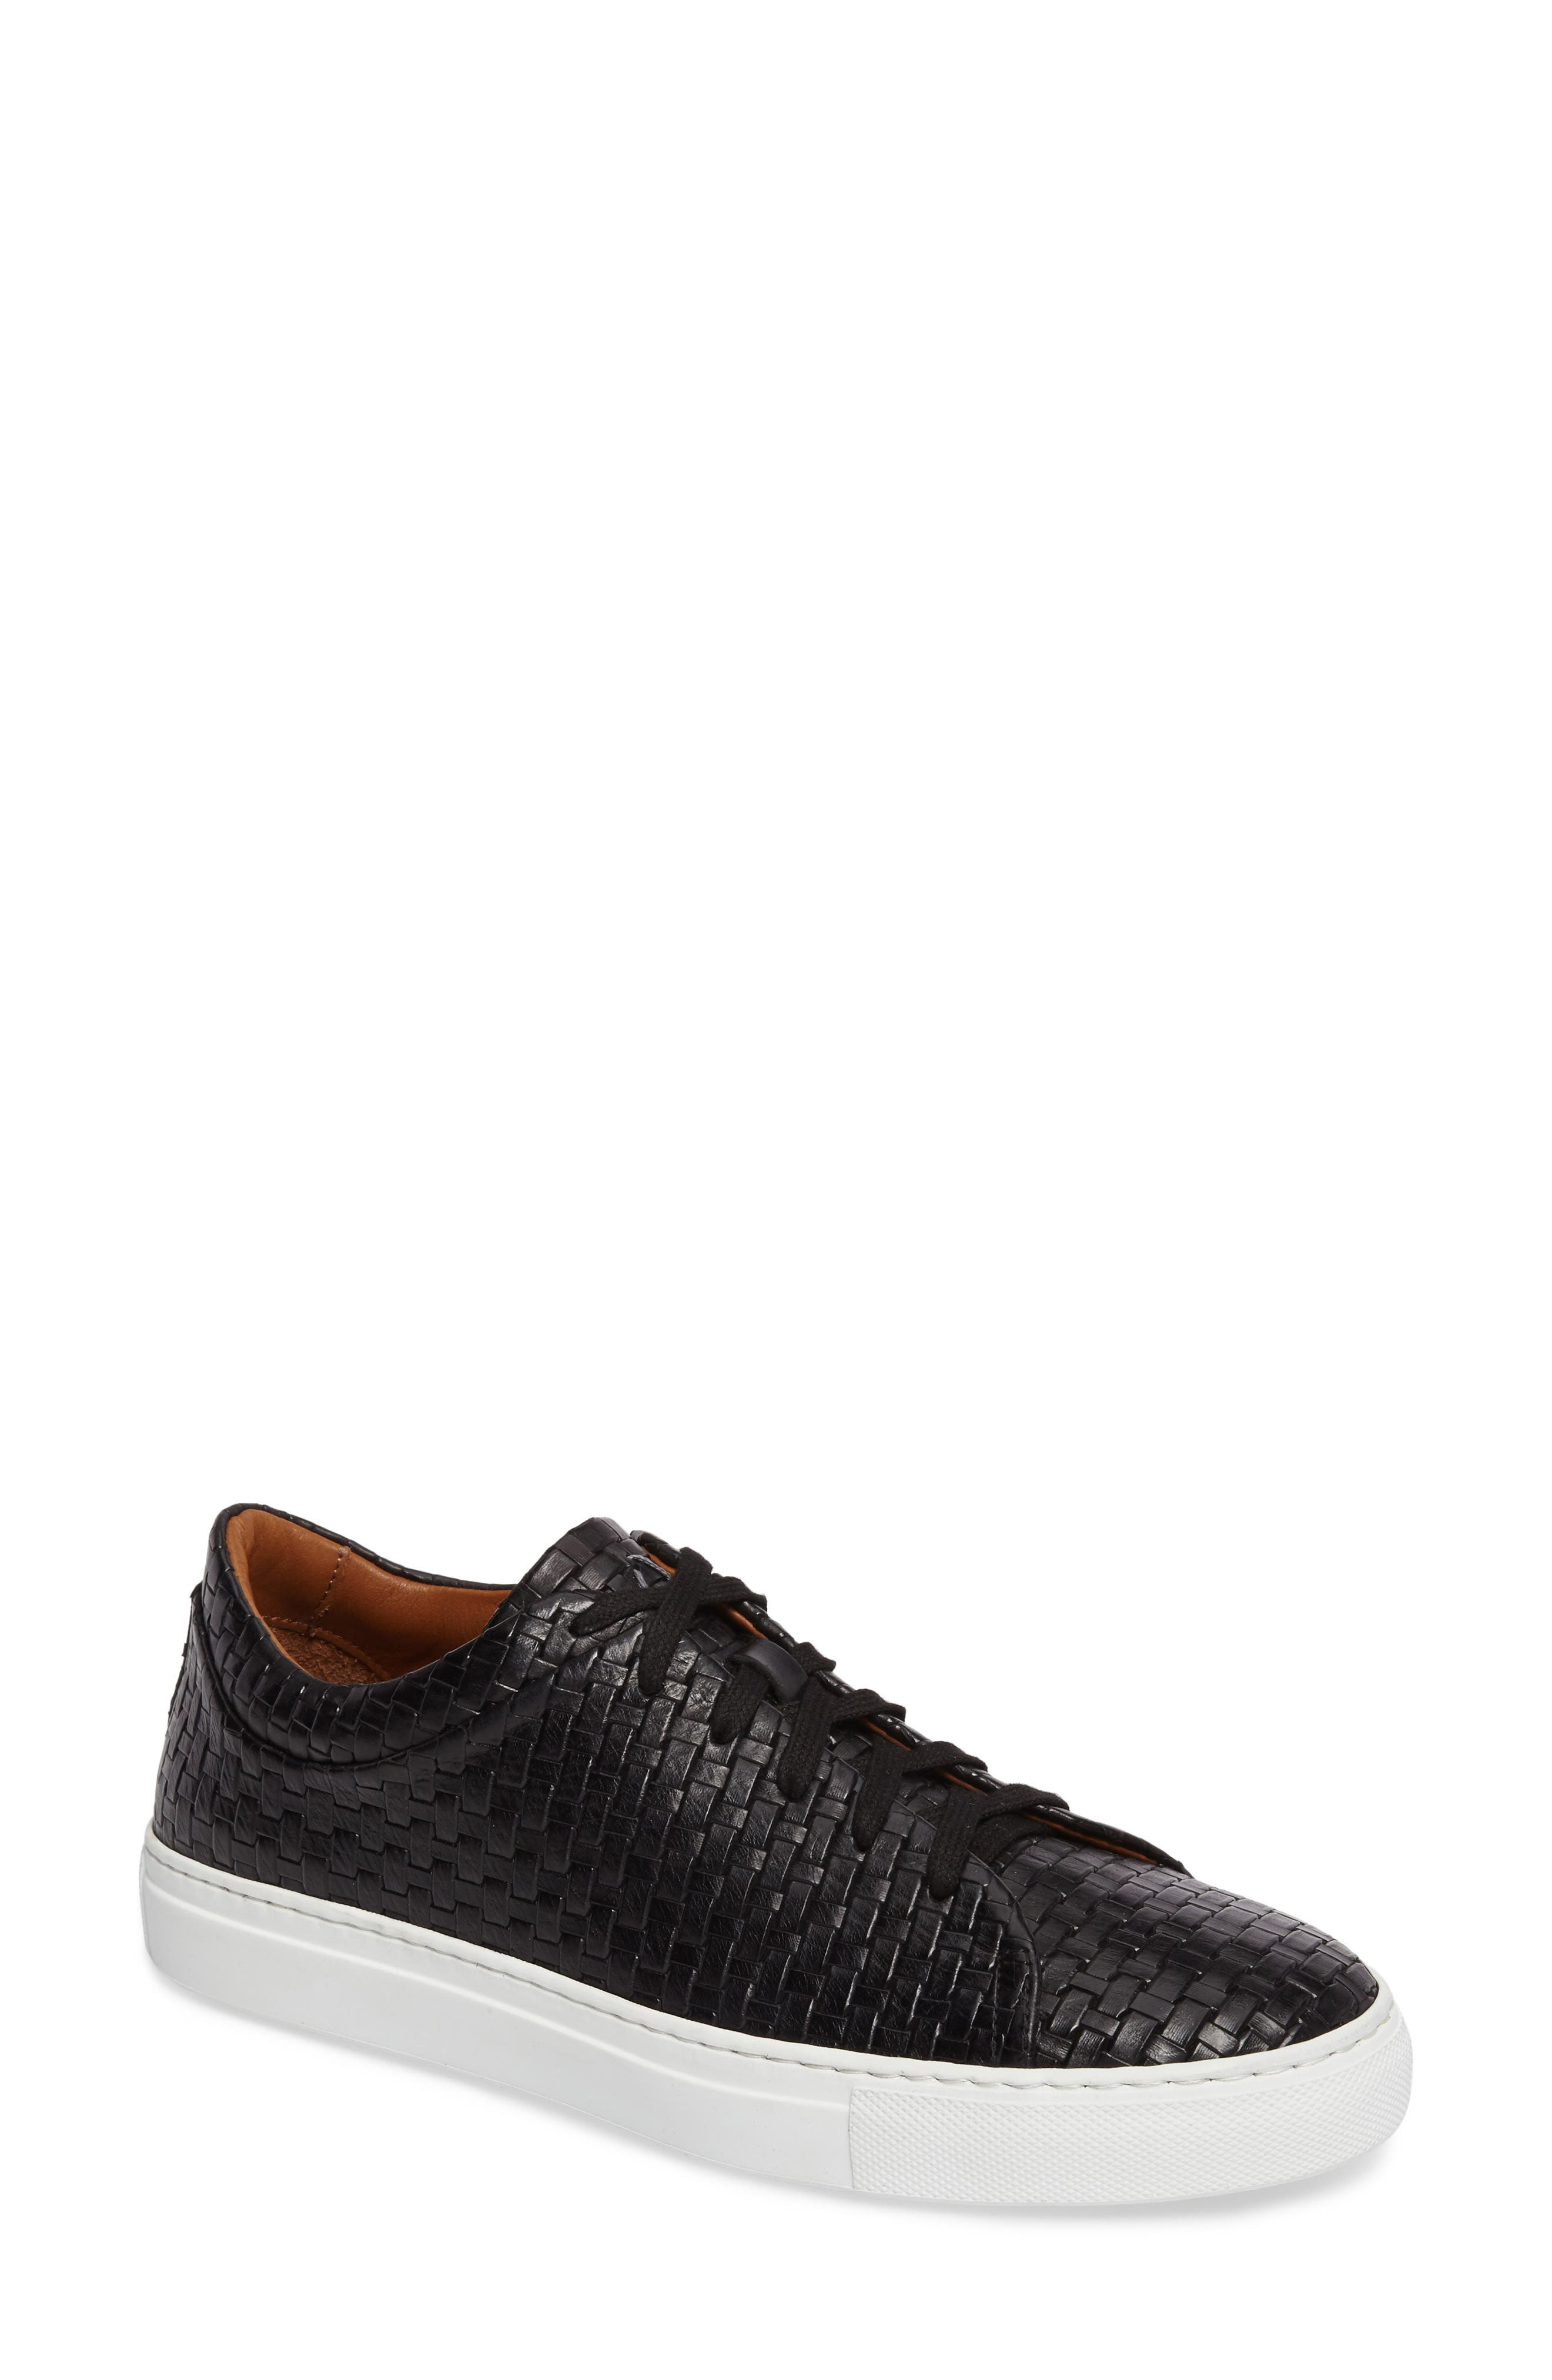 Avery Weatherproof Sneaker,                             Main thumbnail 1, color,                             BLACK